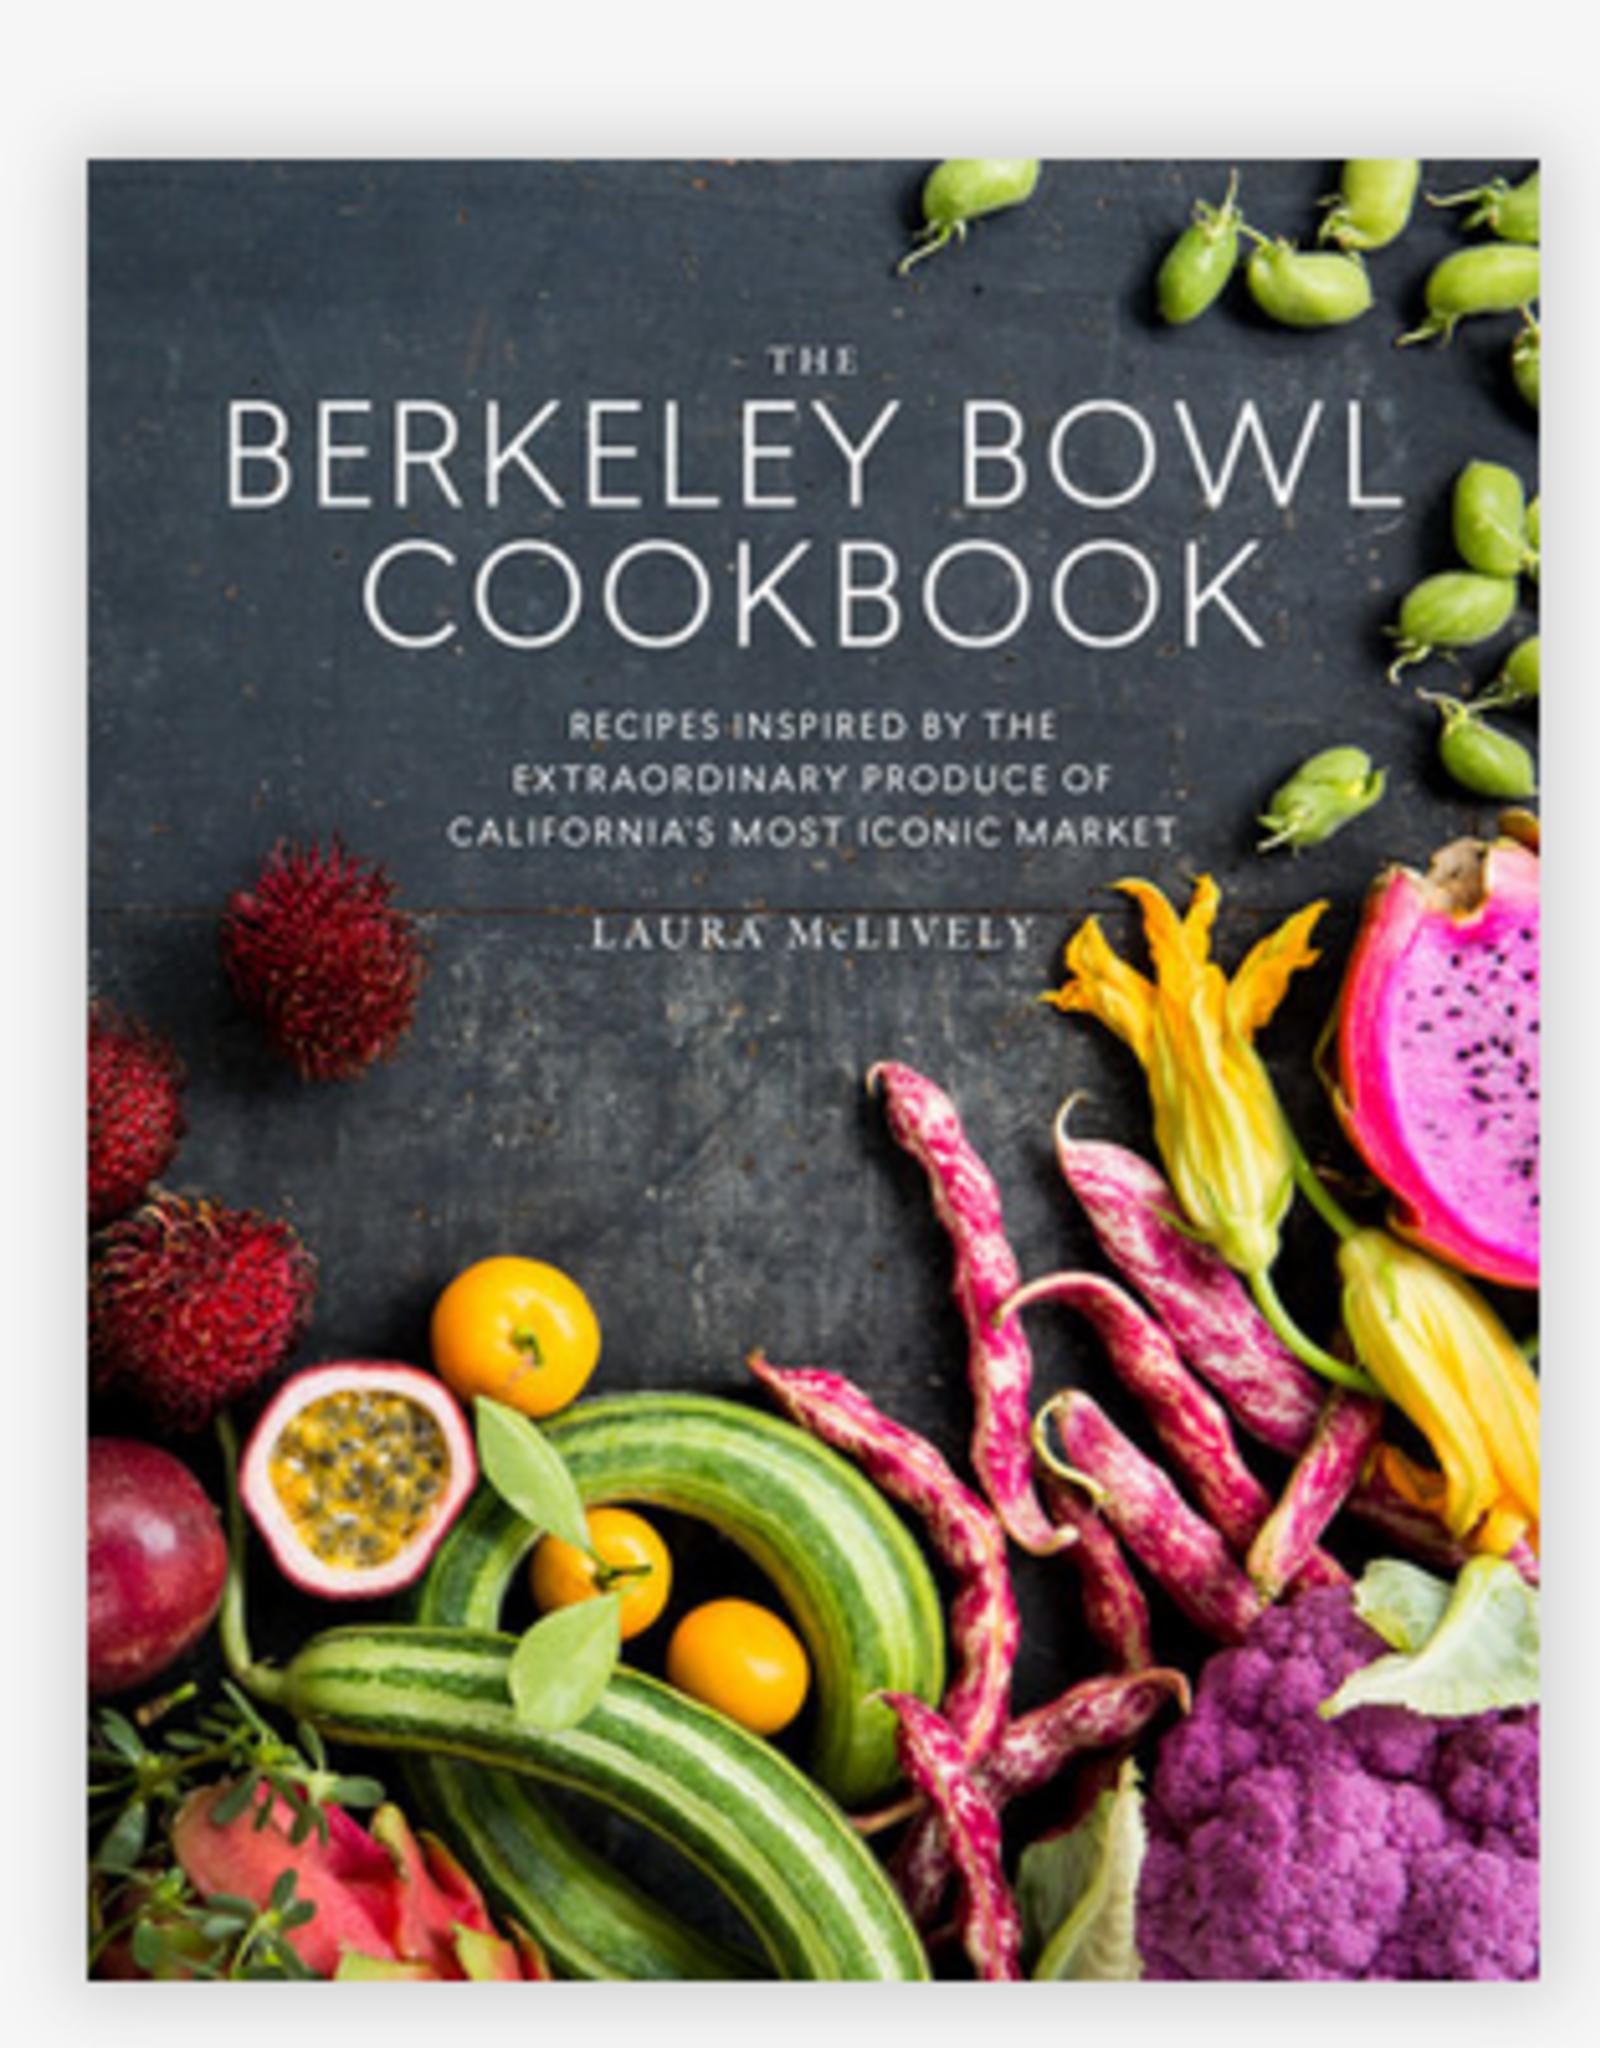 The Berkeley Bowl Cookbook